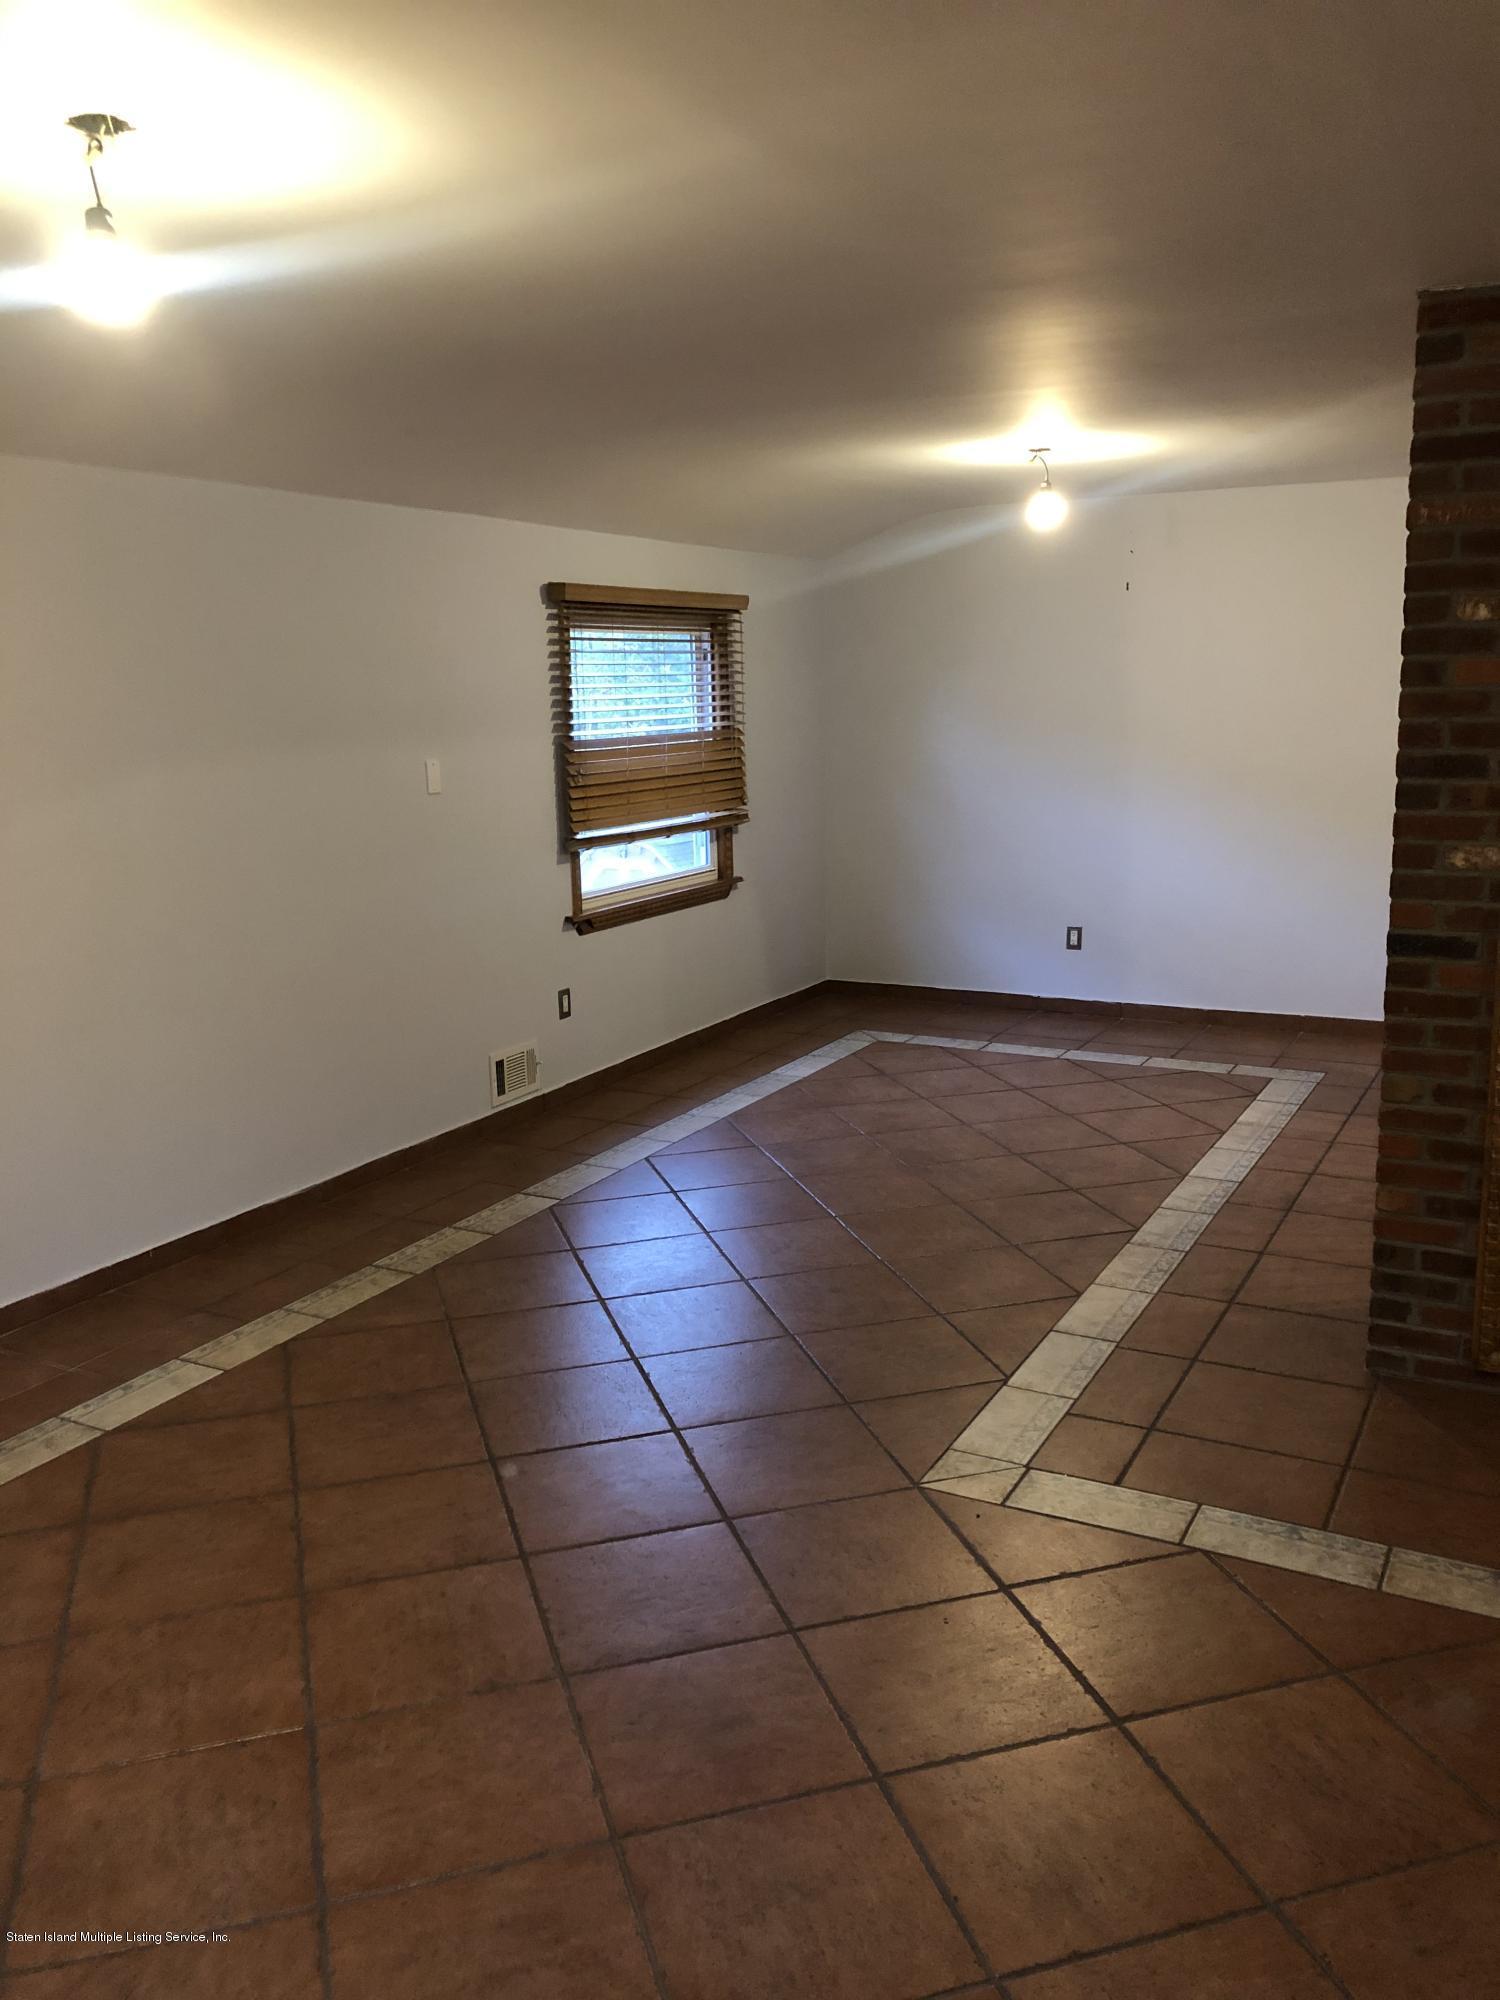 28 Luke Ct Staten Island,New York,10306,United States,3 Bedrooms Bedrooms,6 Rooms Rooms,2 BathroomsBathrooms,Res-Rental,Luke Ct,1132943